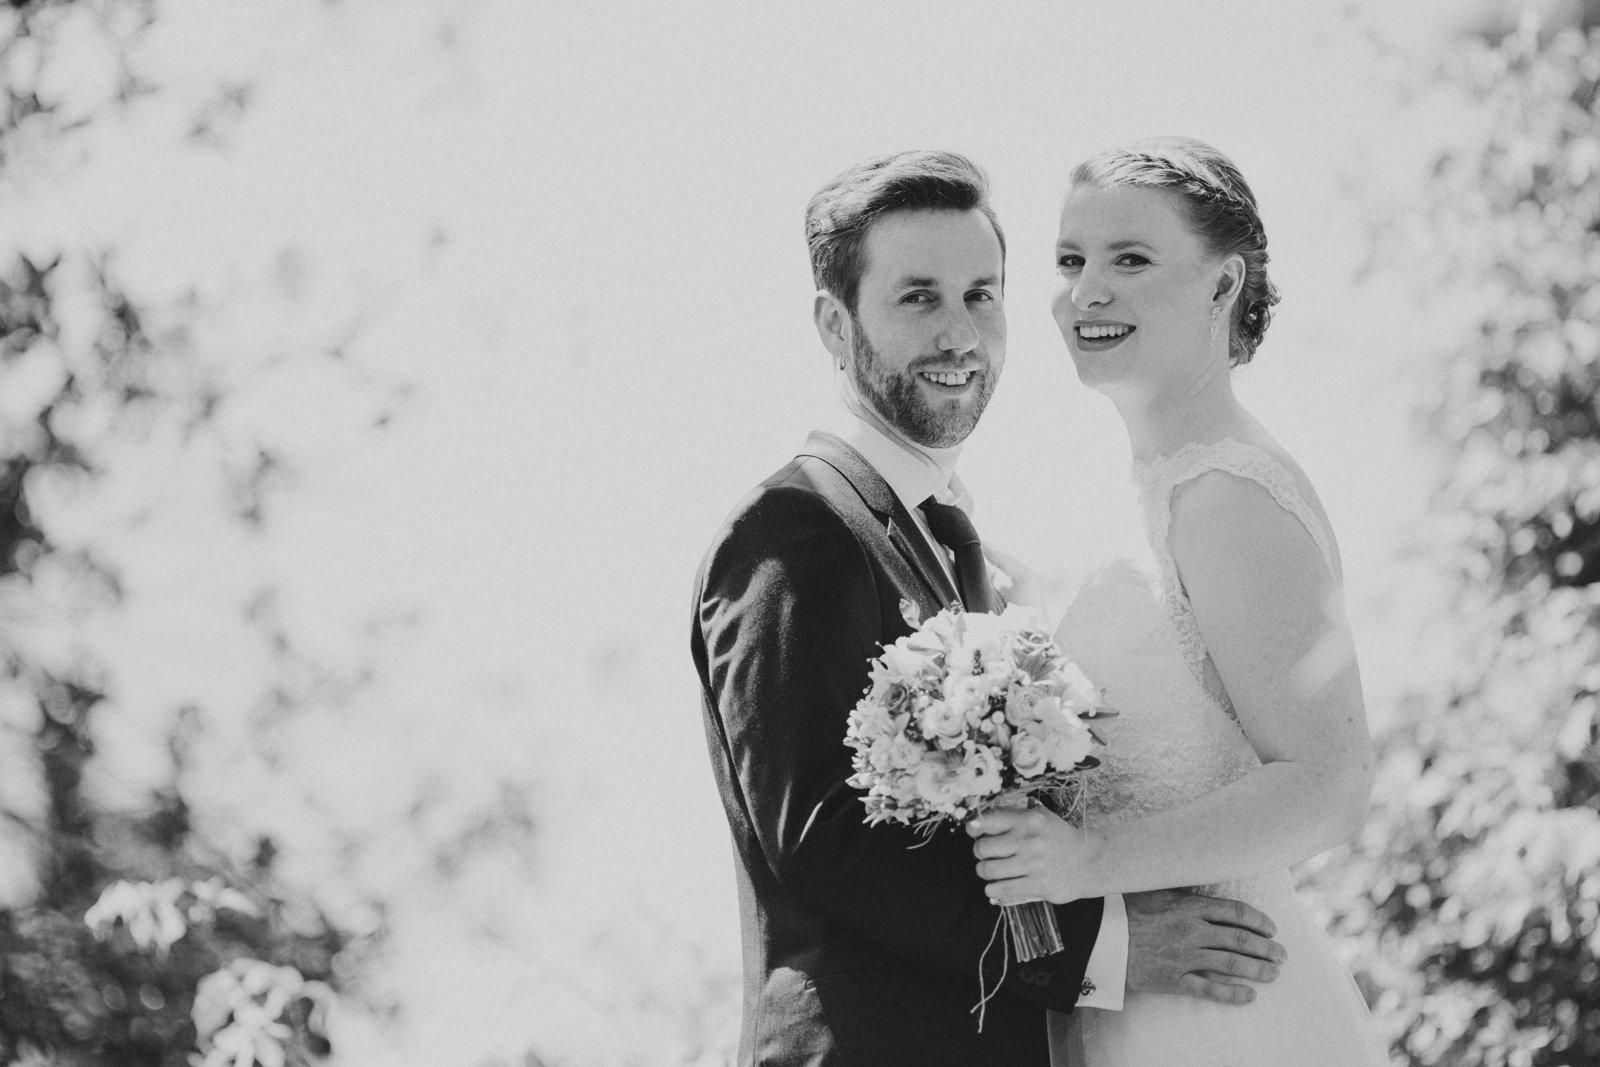 038_jlp_wedding_20160709_janine&georg_highlights